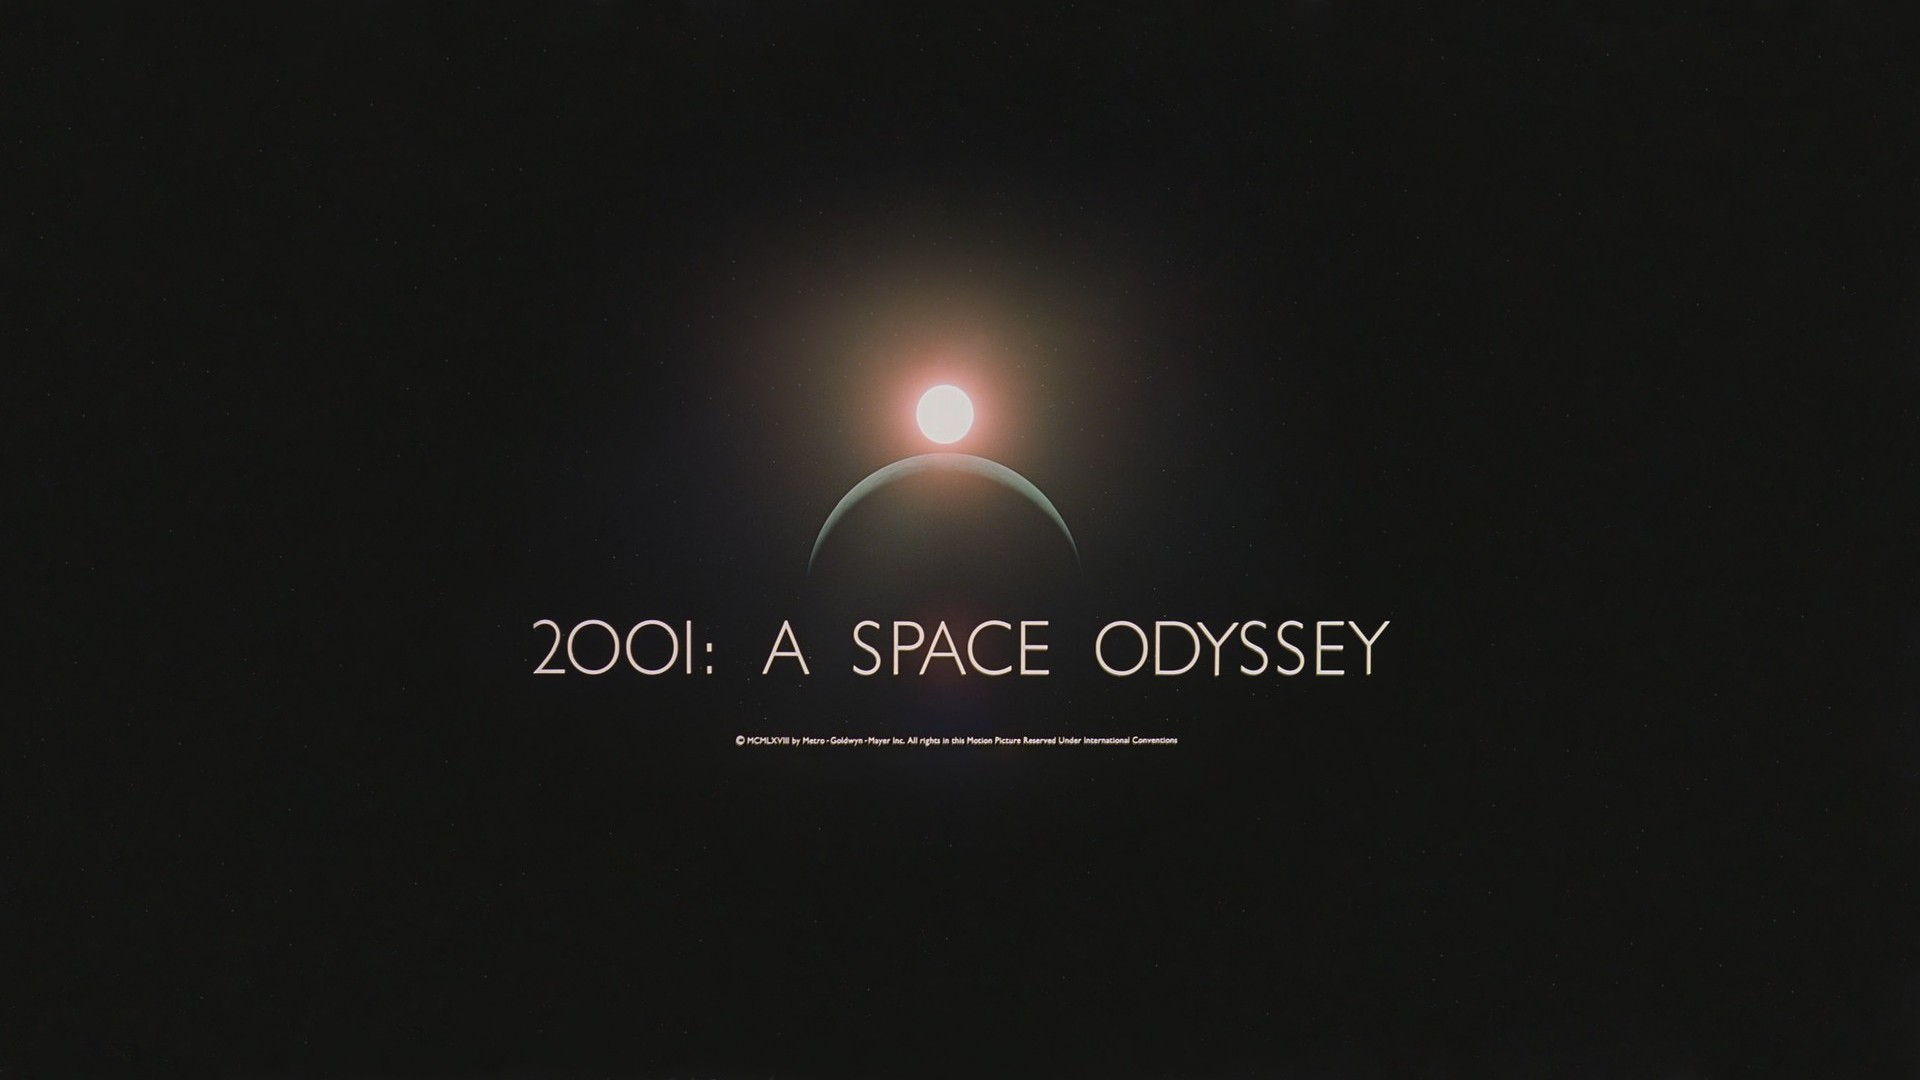 2001: A Space Odyssey, Movies. Interstellar (movie), Gargantua, Black Holes  Wallpaper HD